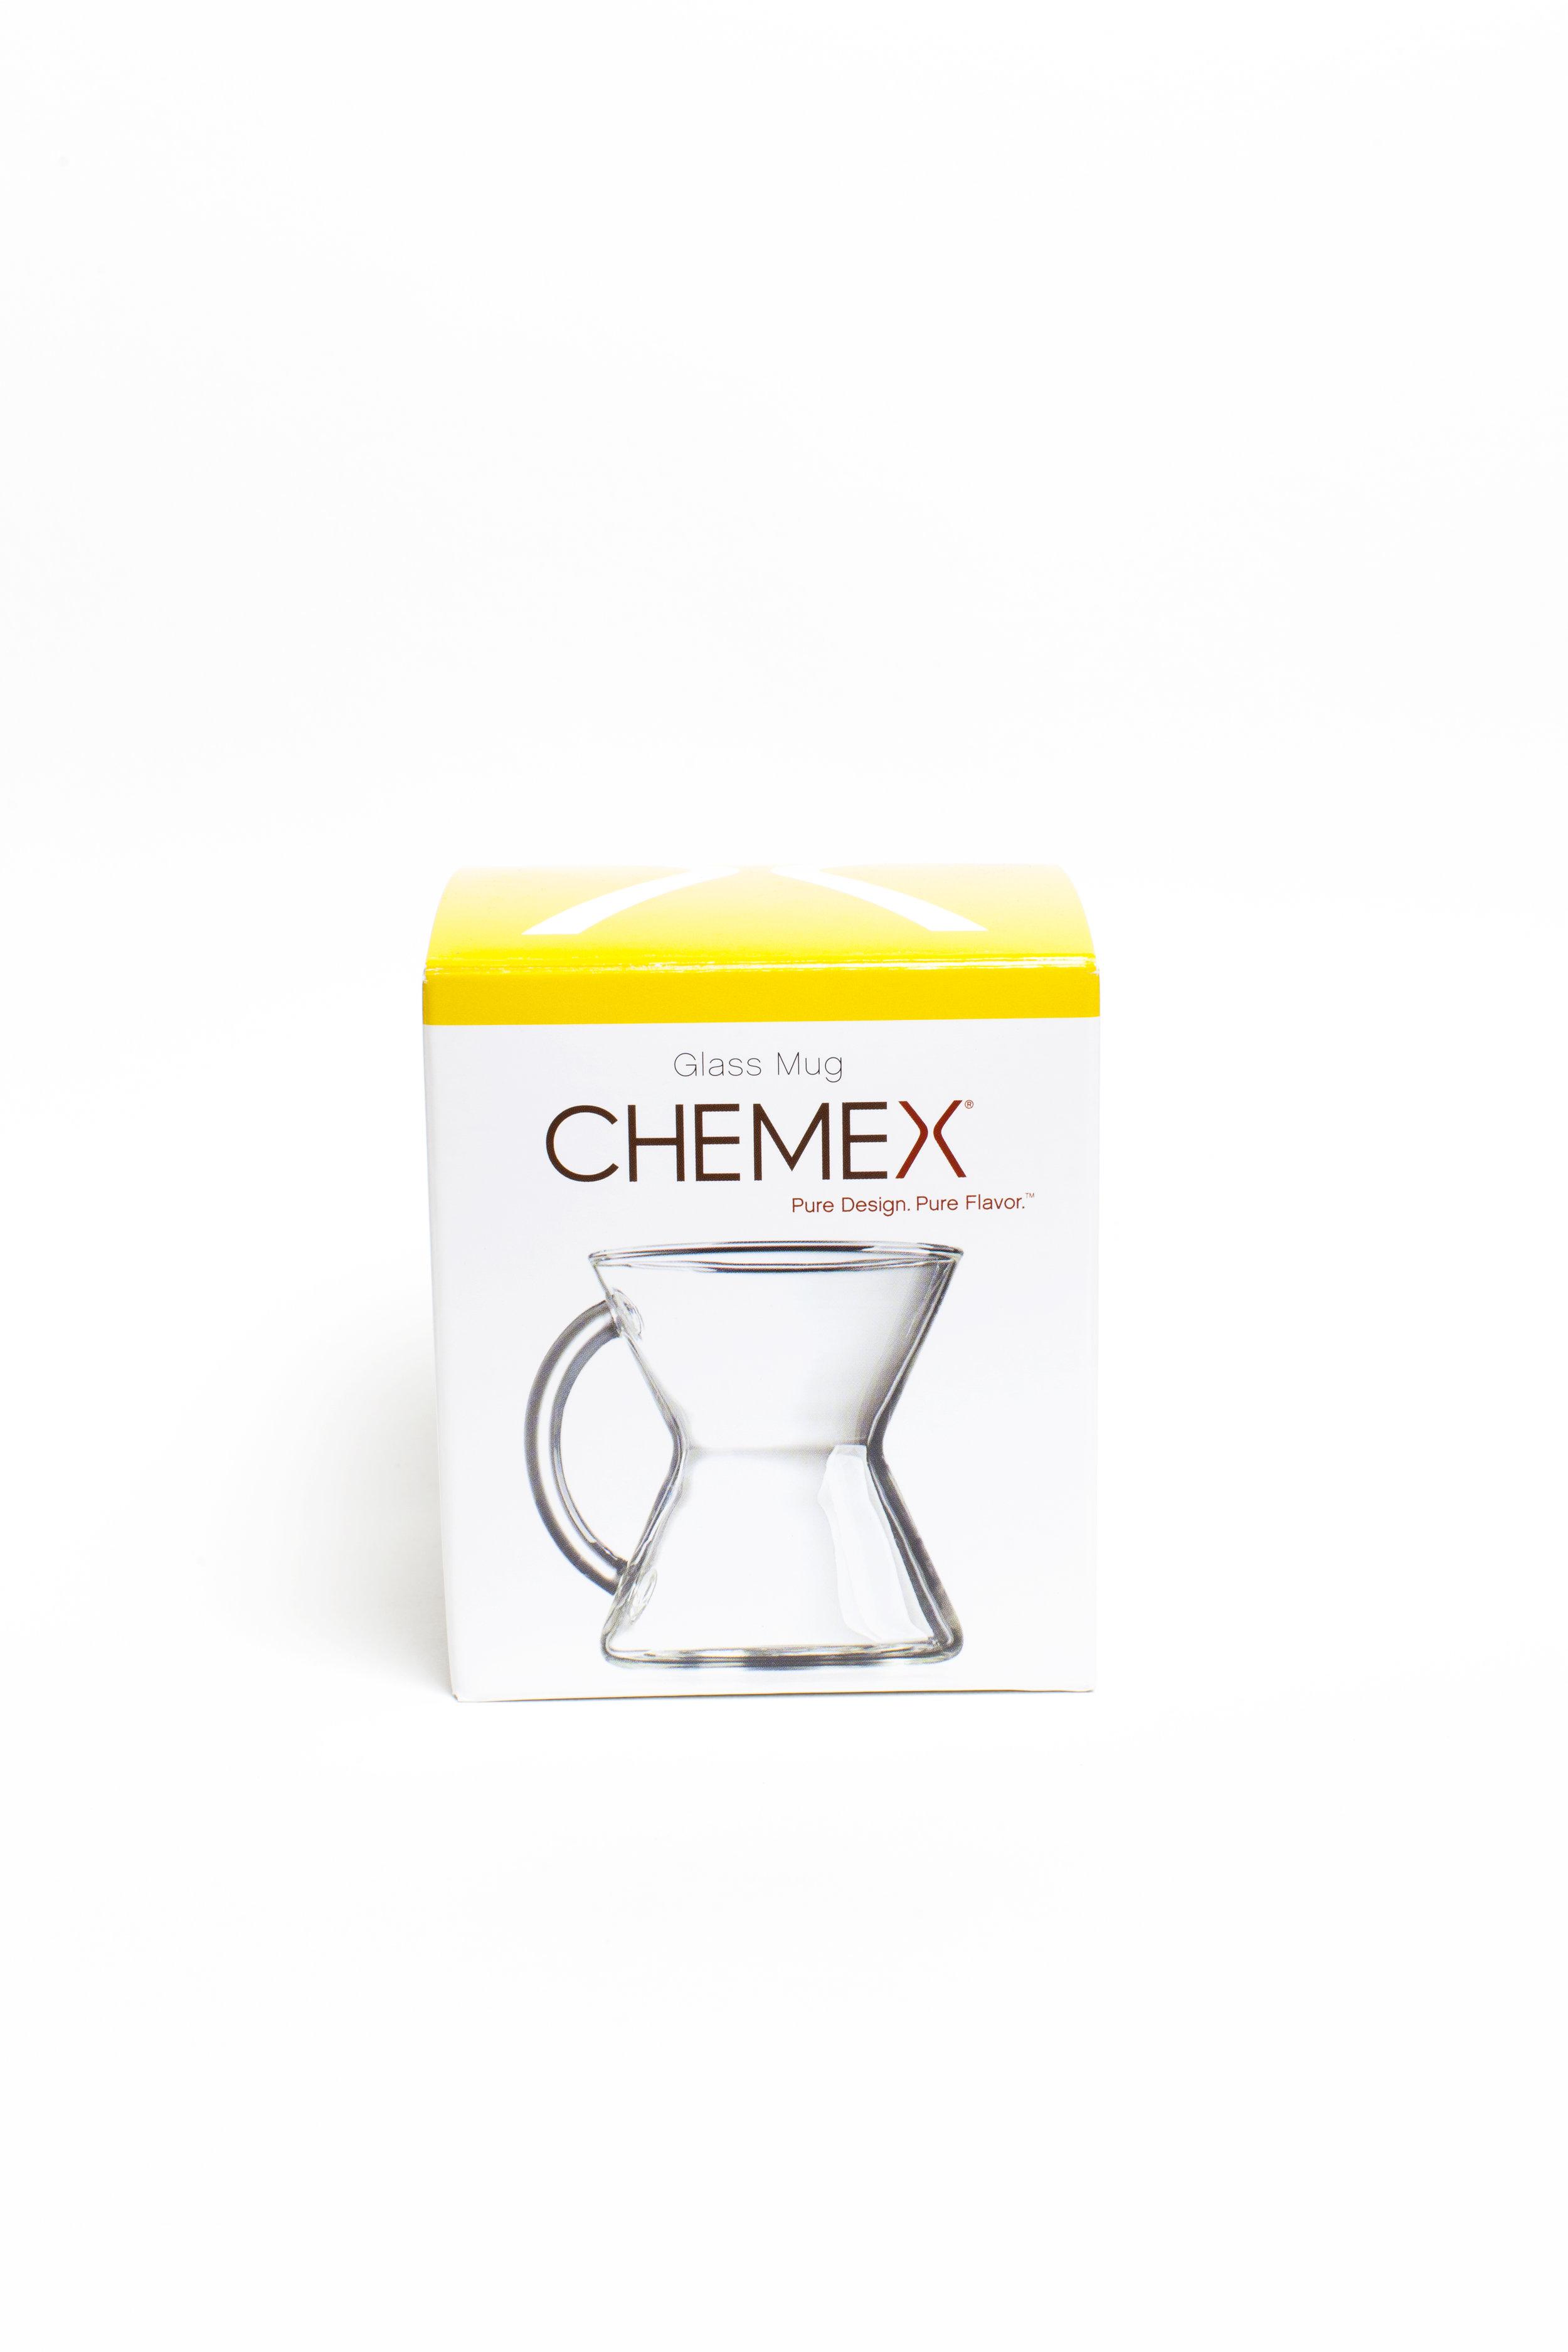 0814-RR-25-ChemexMug-Box-Final.jpg